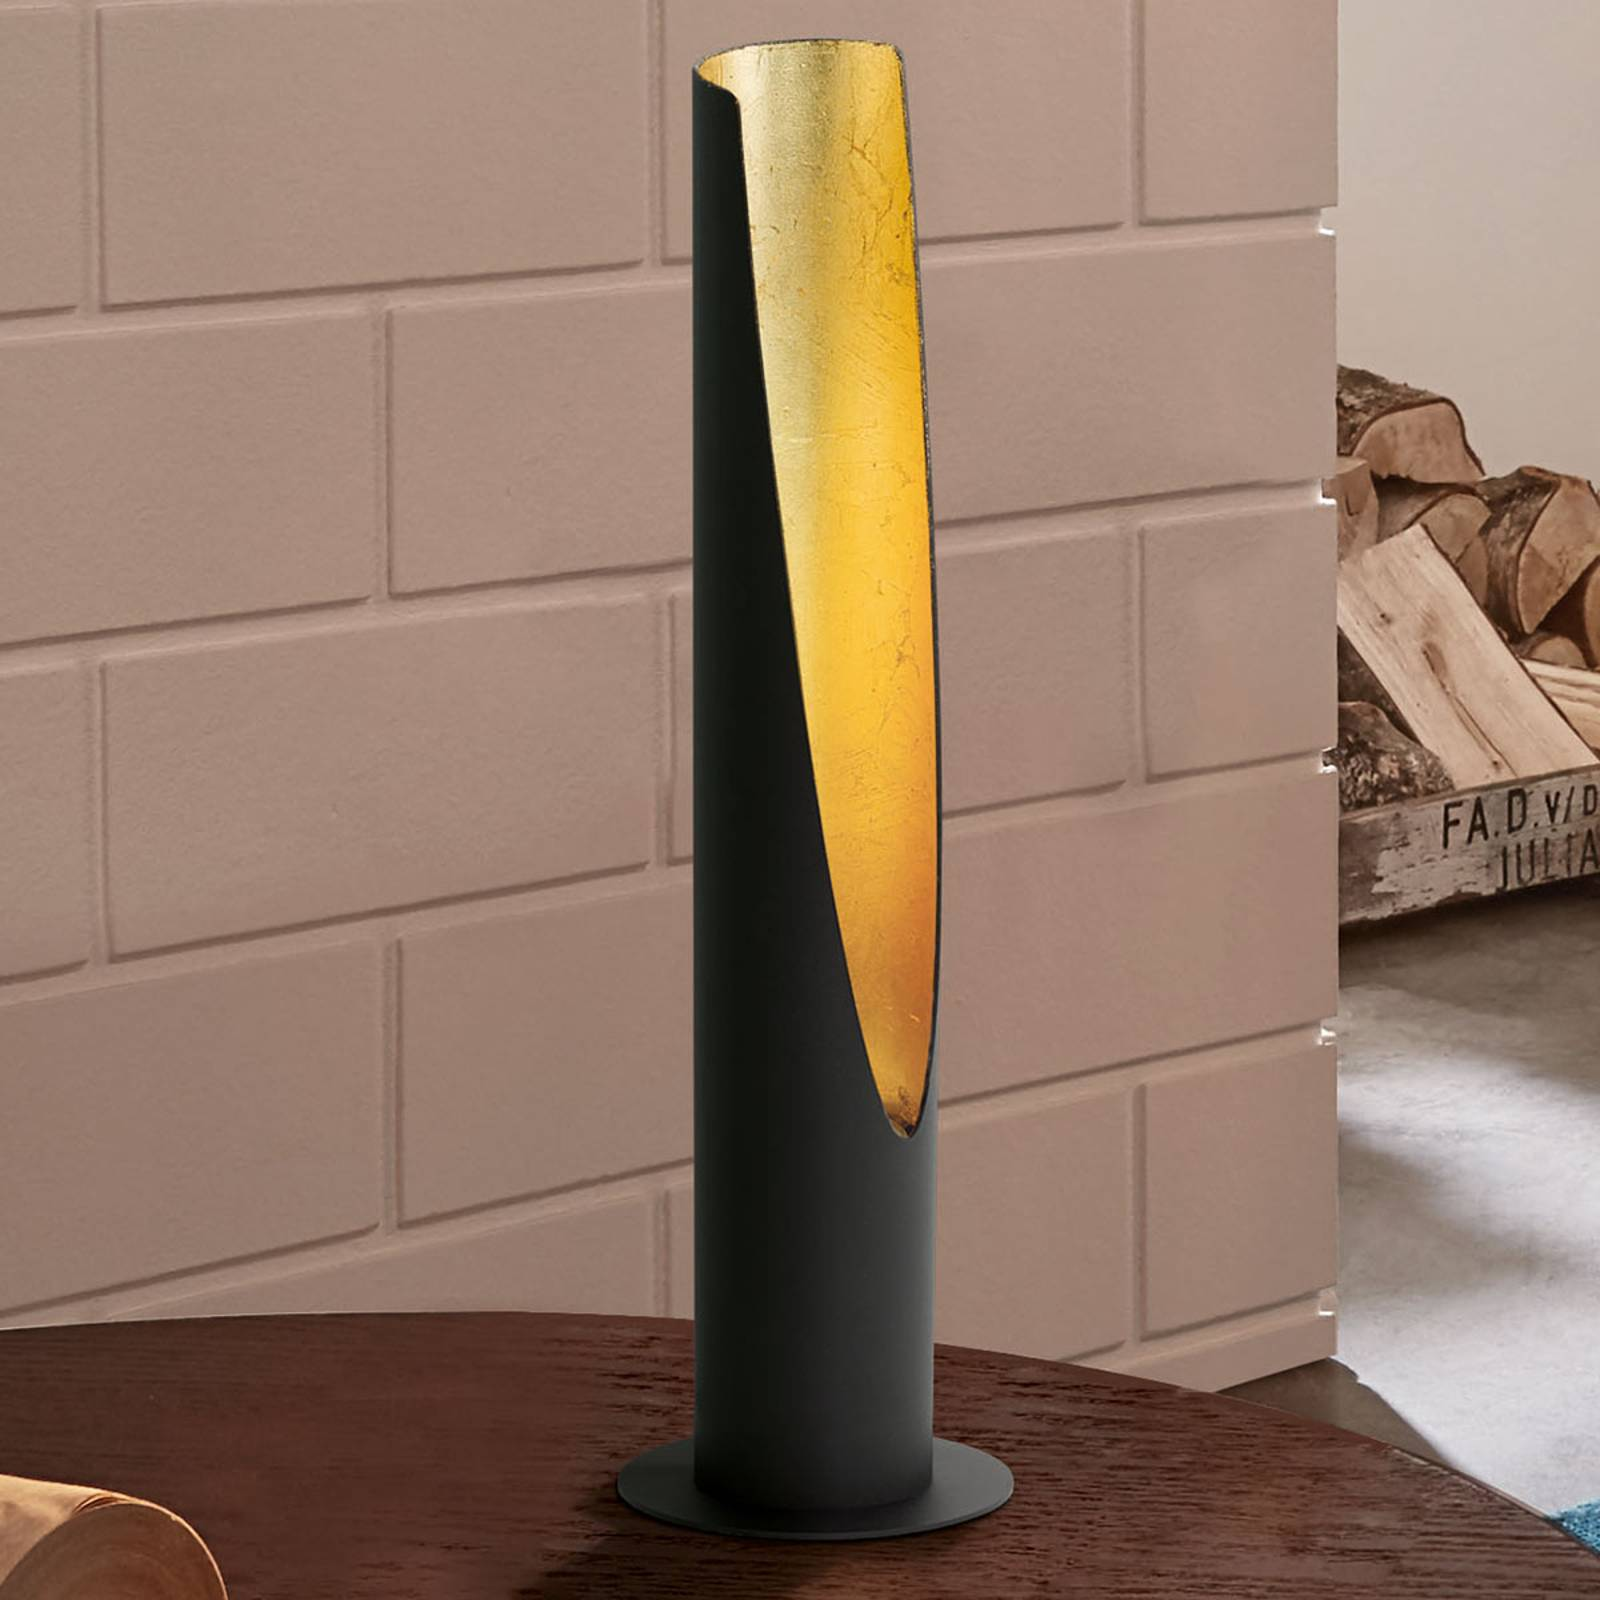 LED-pöytälamppu Barbotto musta/kulta